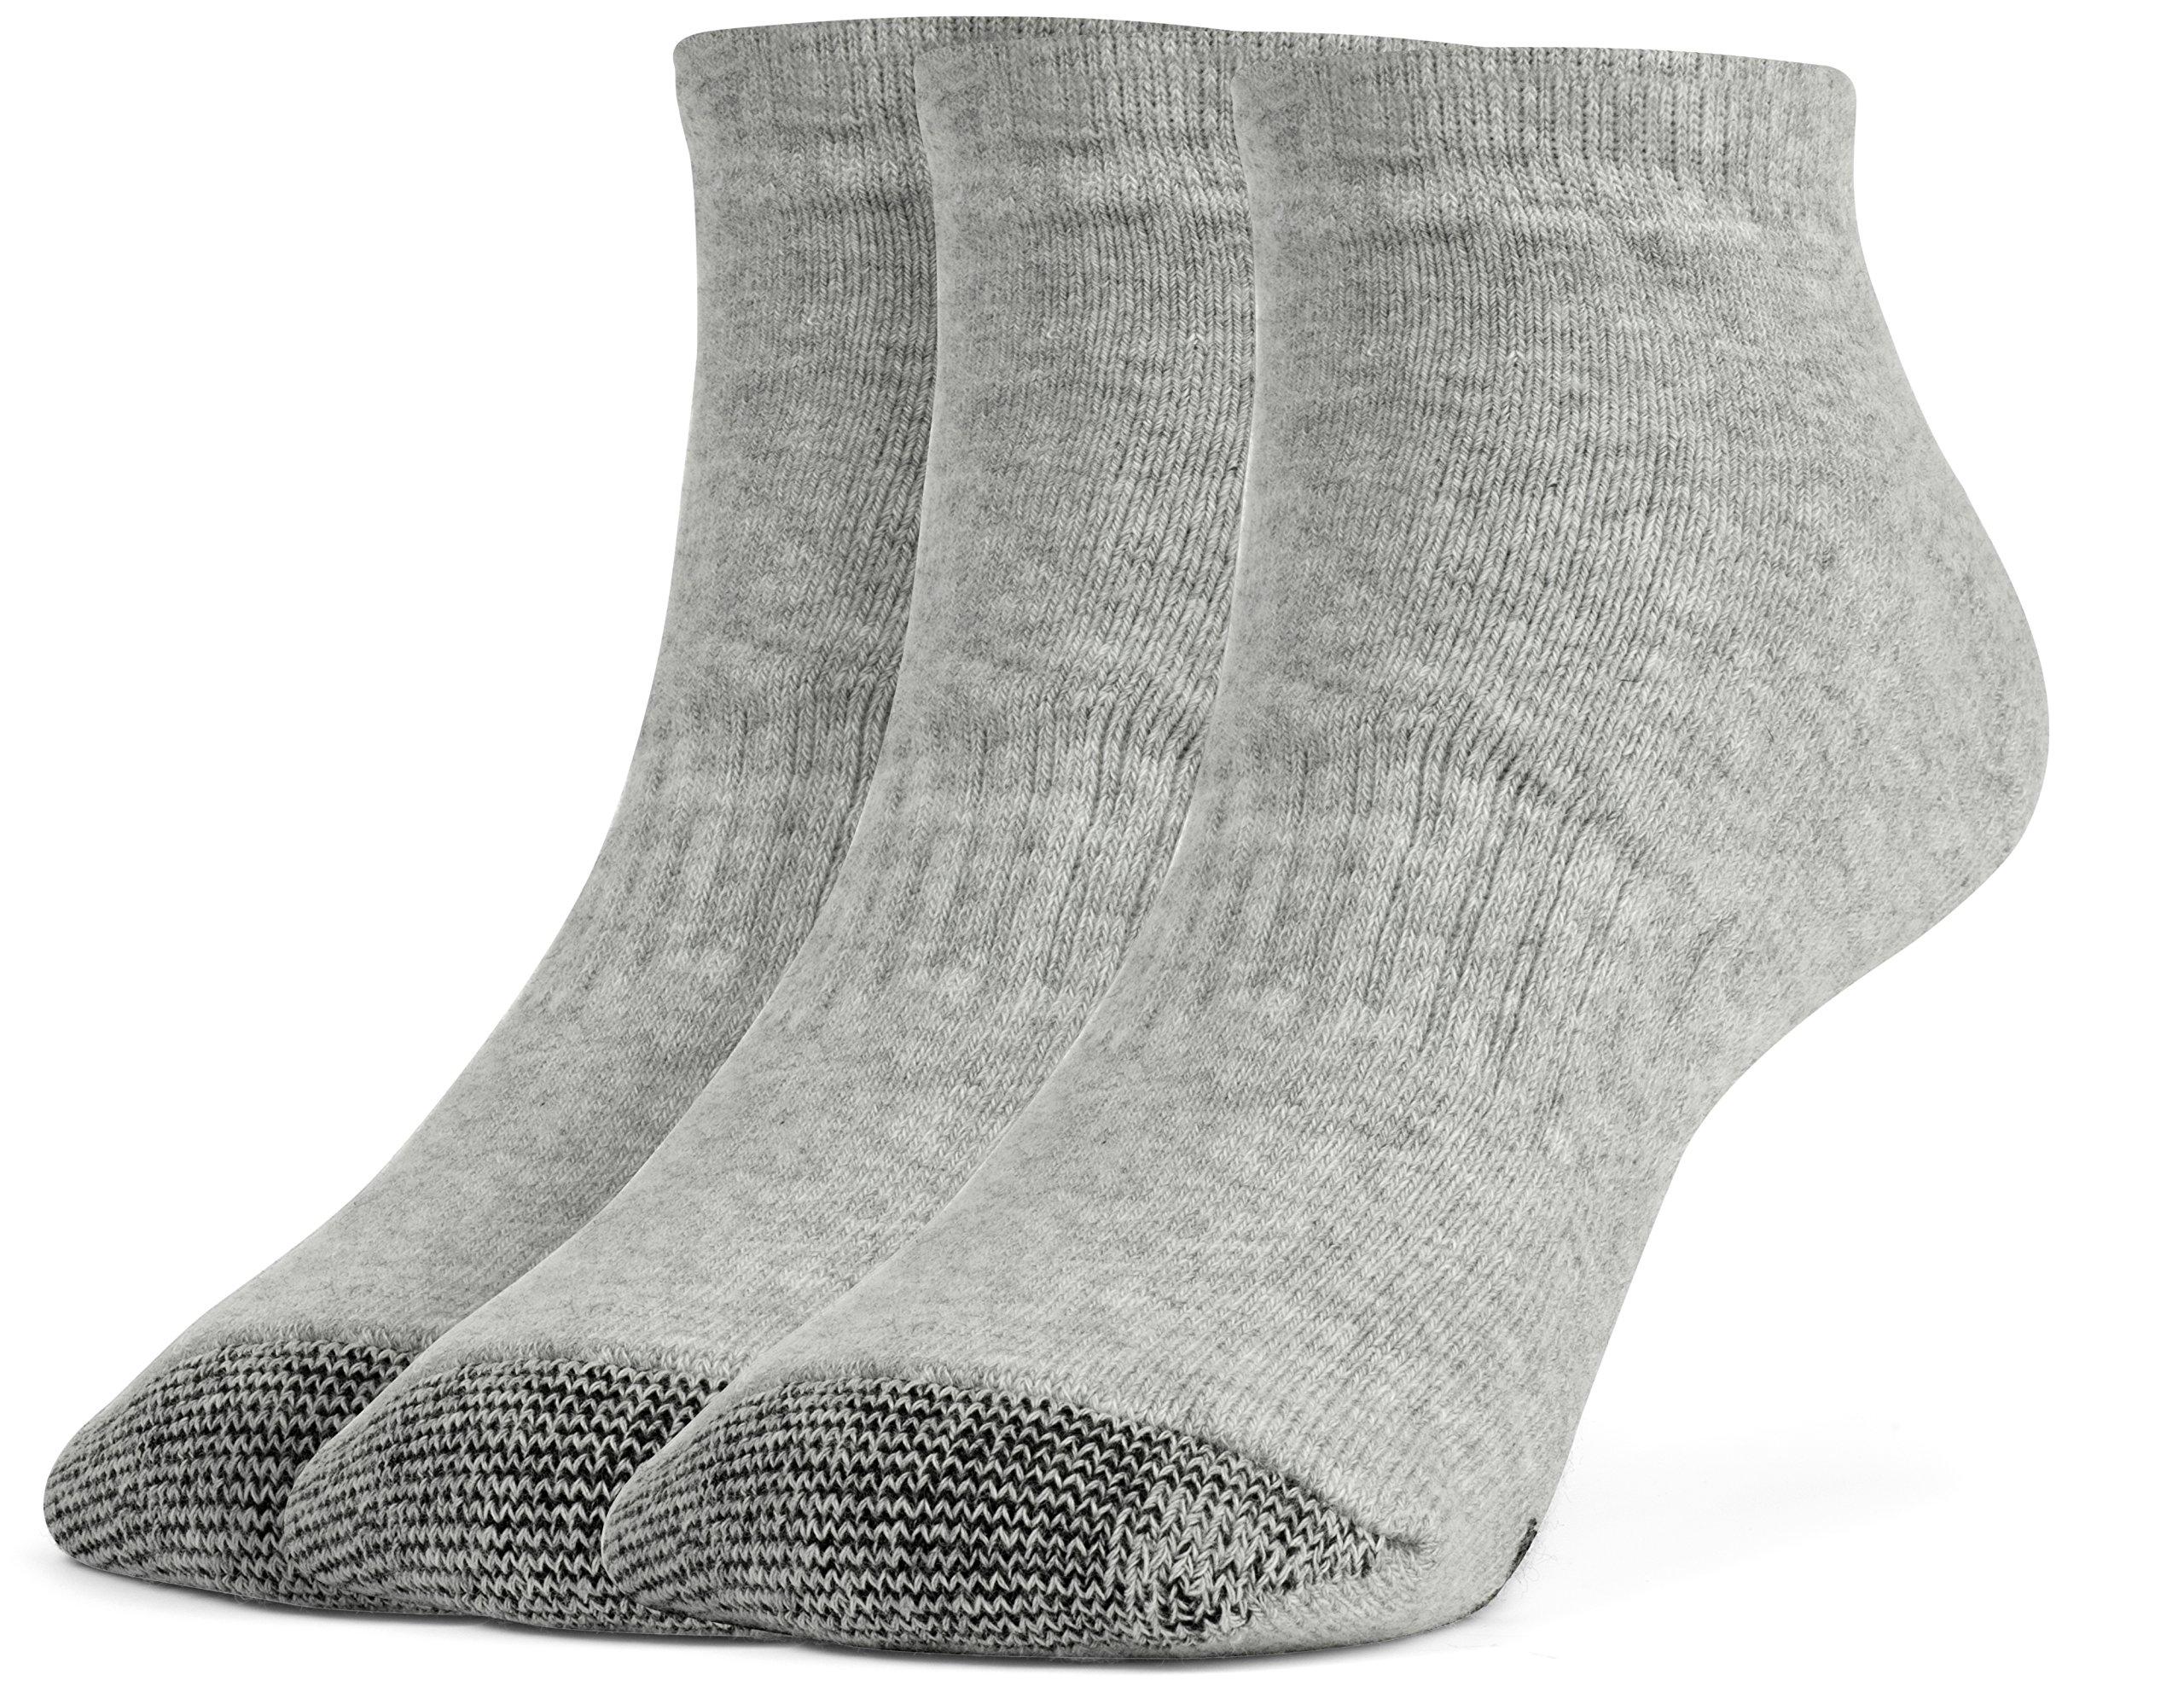 Galiva Boys' Cotton Extra Soft Low Cut Cushion Socks - 3 Pairs, Small, Grey